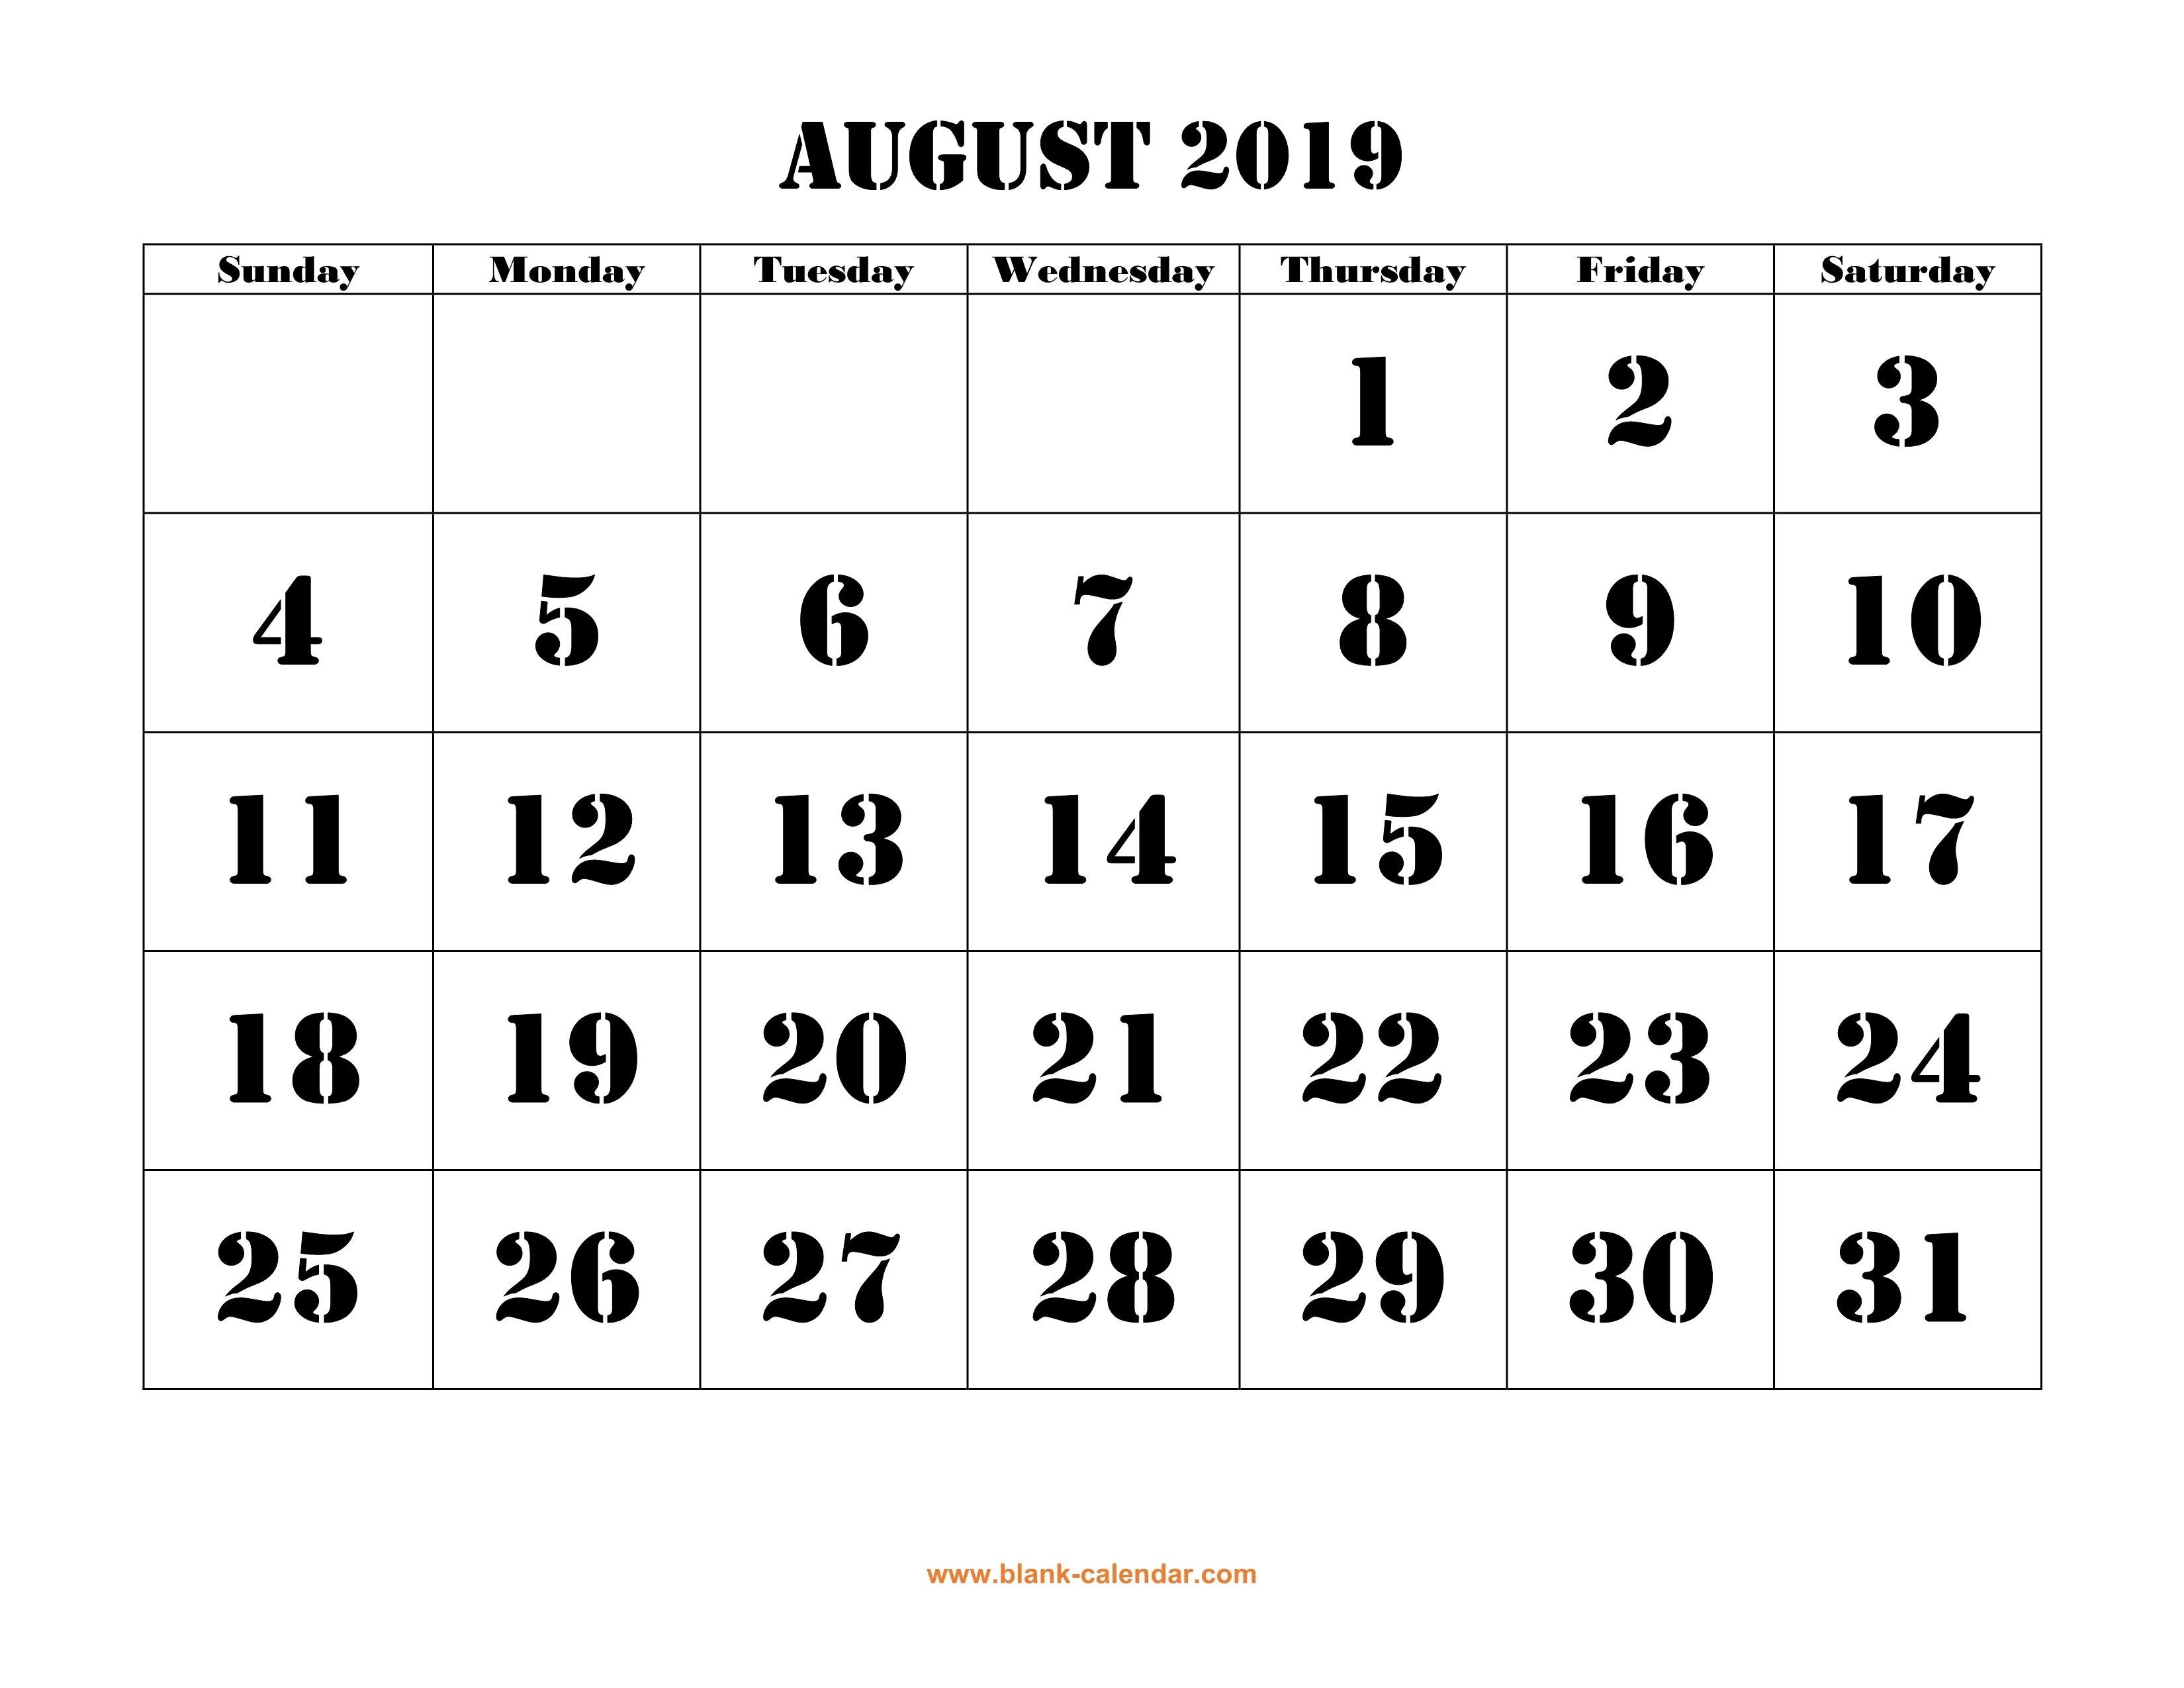 Free Download Printable August 2019 Calendar, Large Font Design 8 August 2019 Calendar